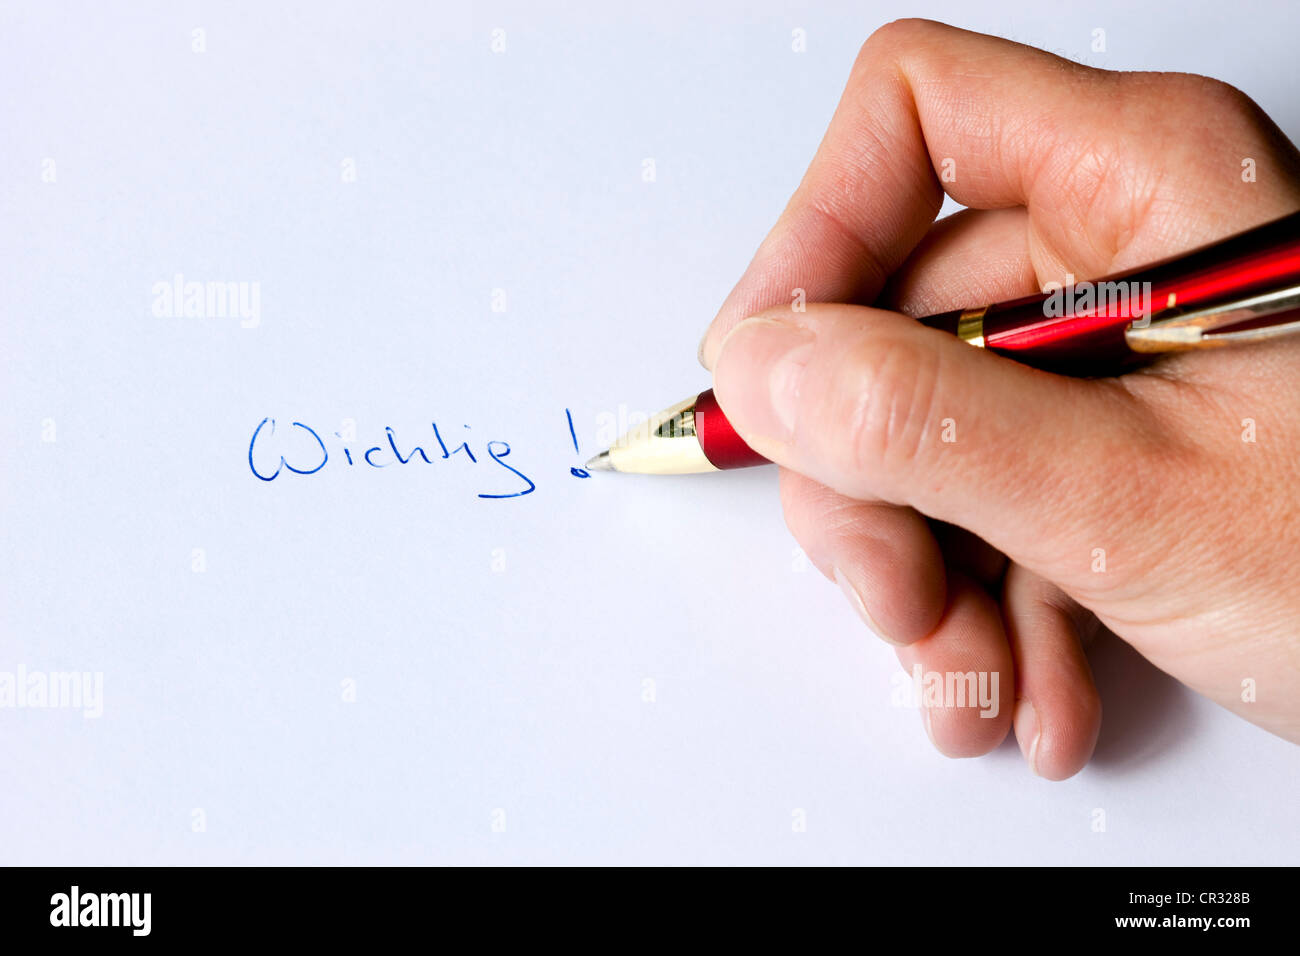 Note Wichtig or important written in ballpoint pen - Stock Image